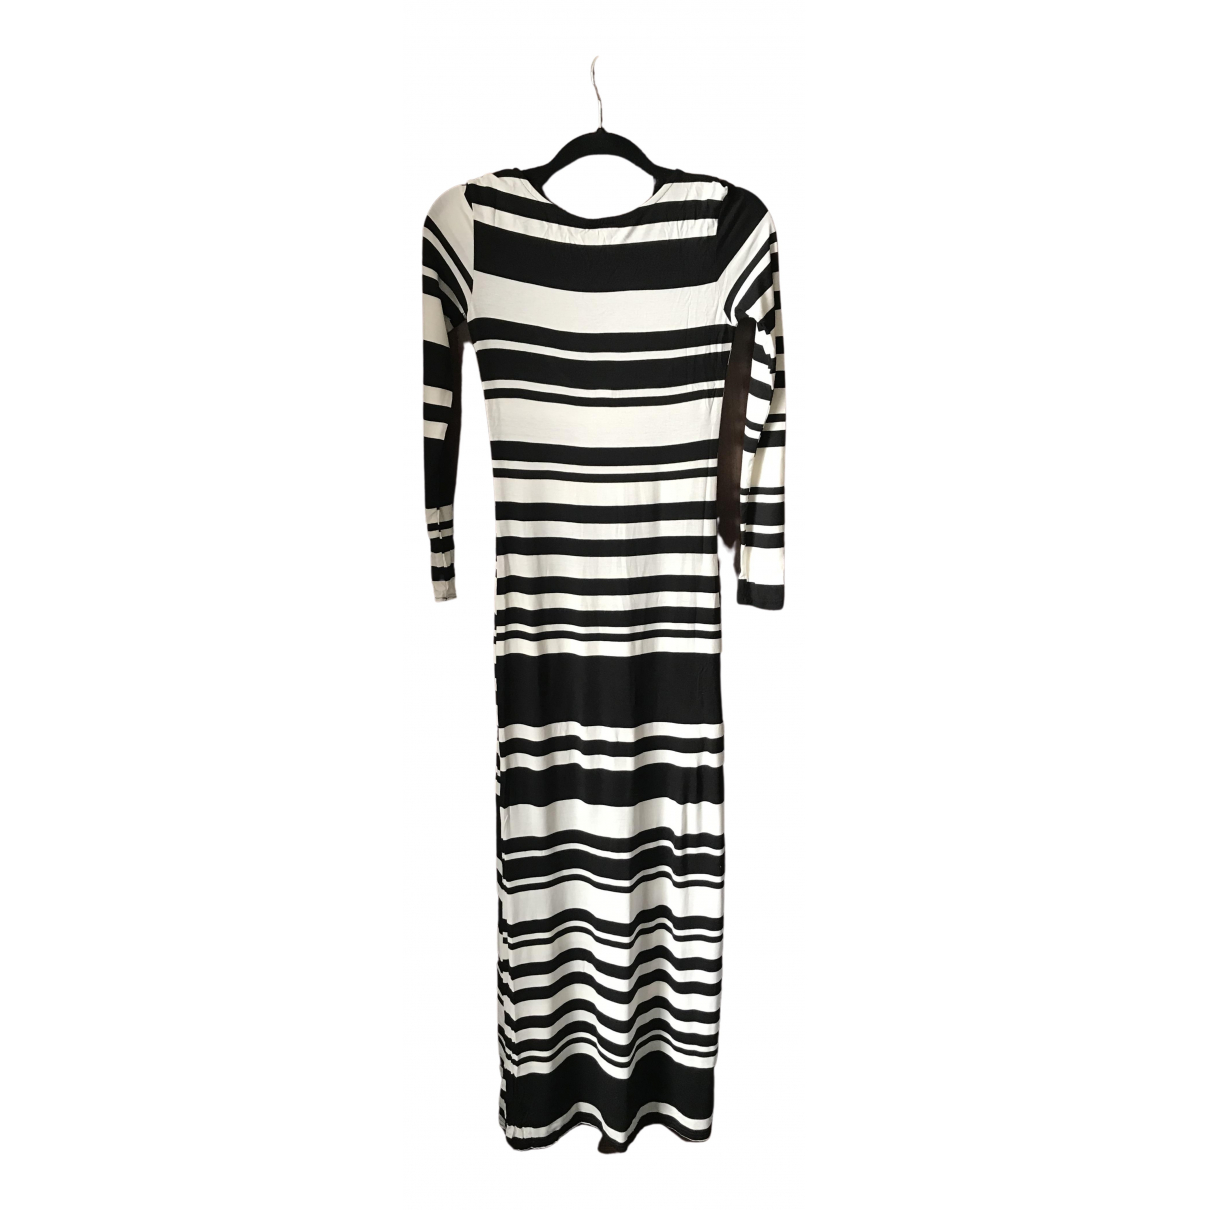 River Island N Black dress for Women 34 FR